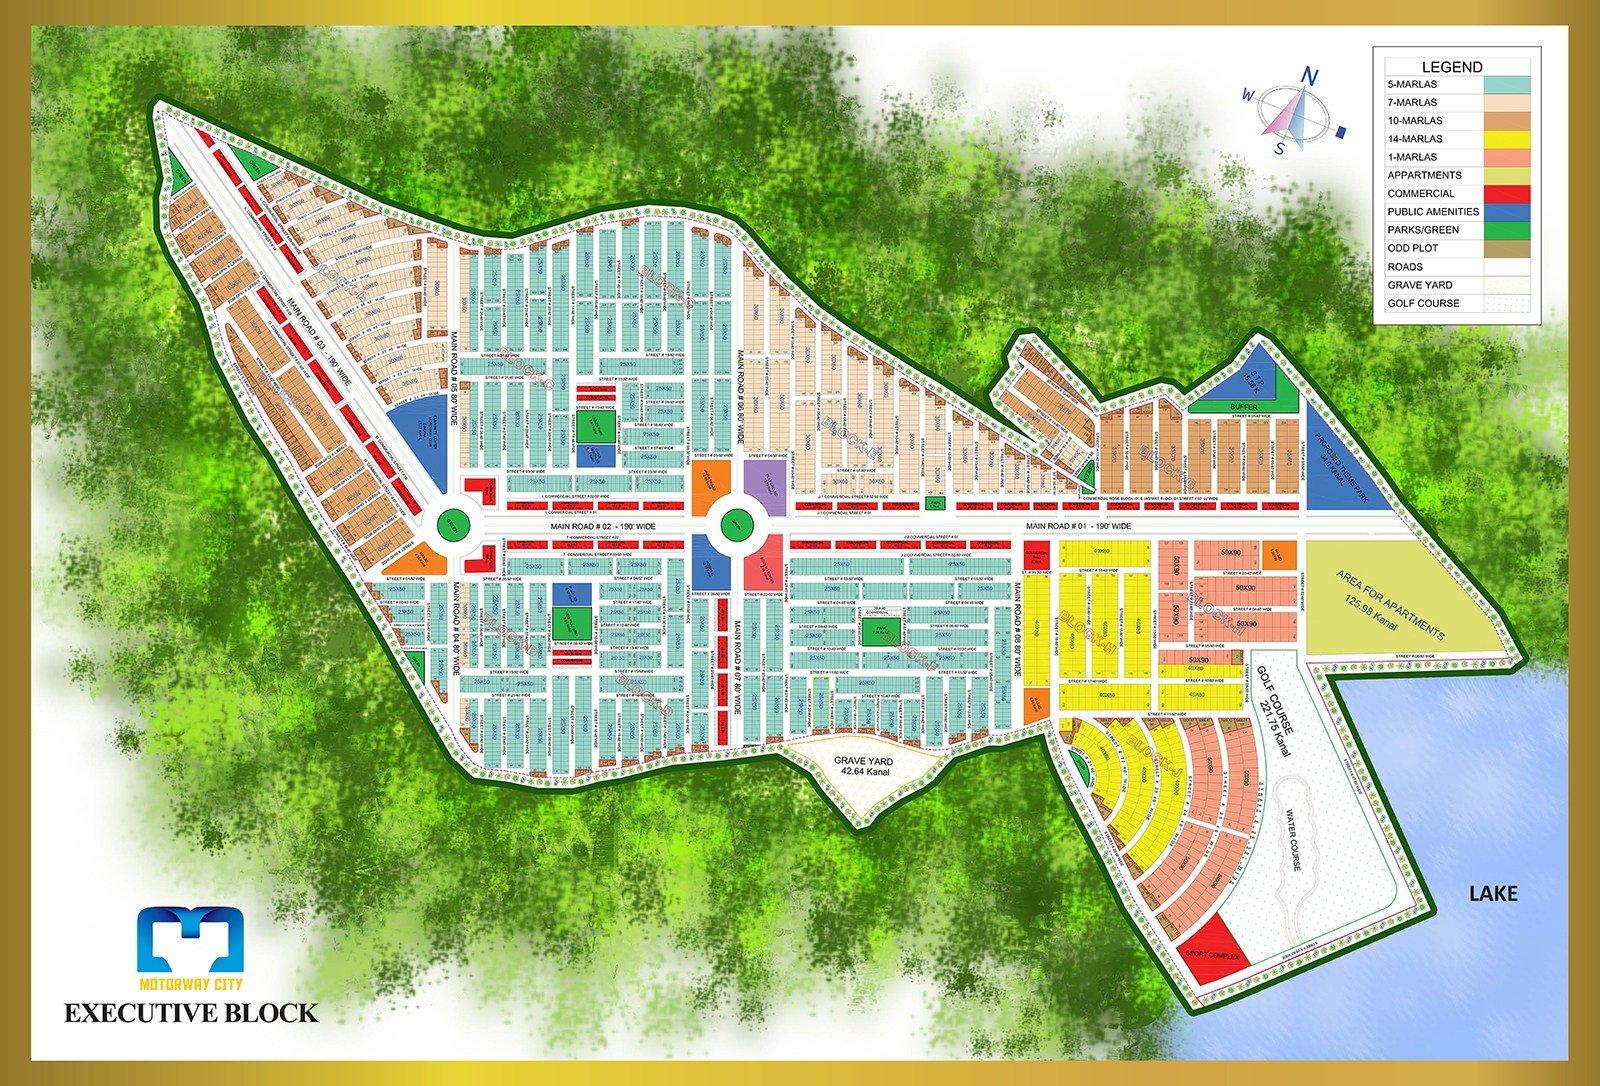 Motorway City Islamabad - Executive Block Map